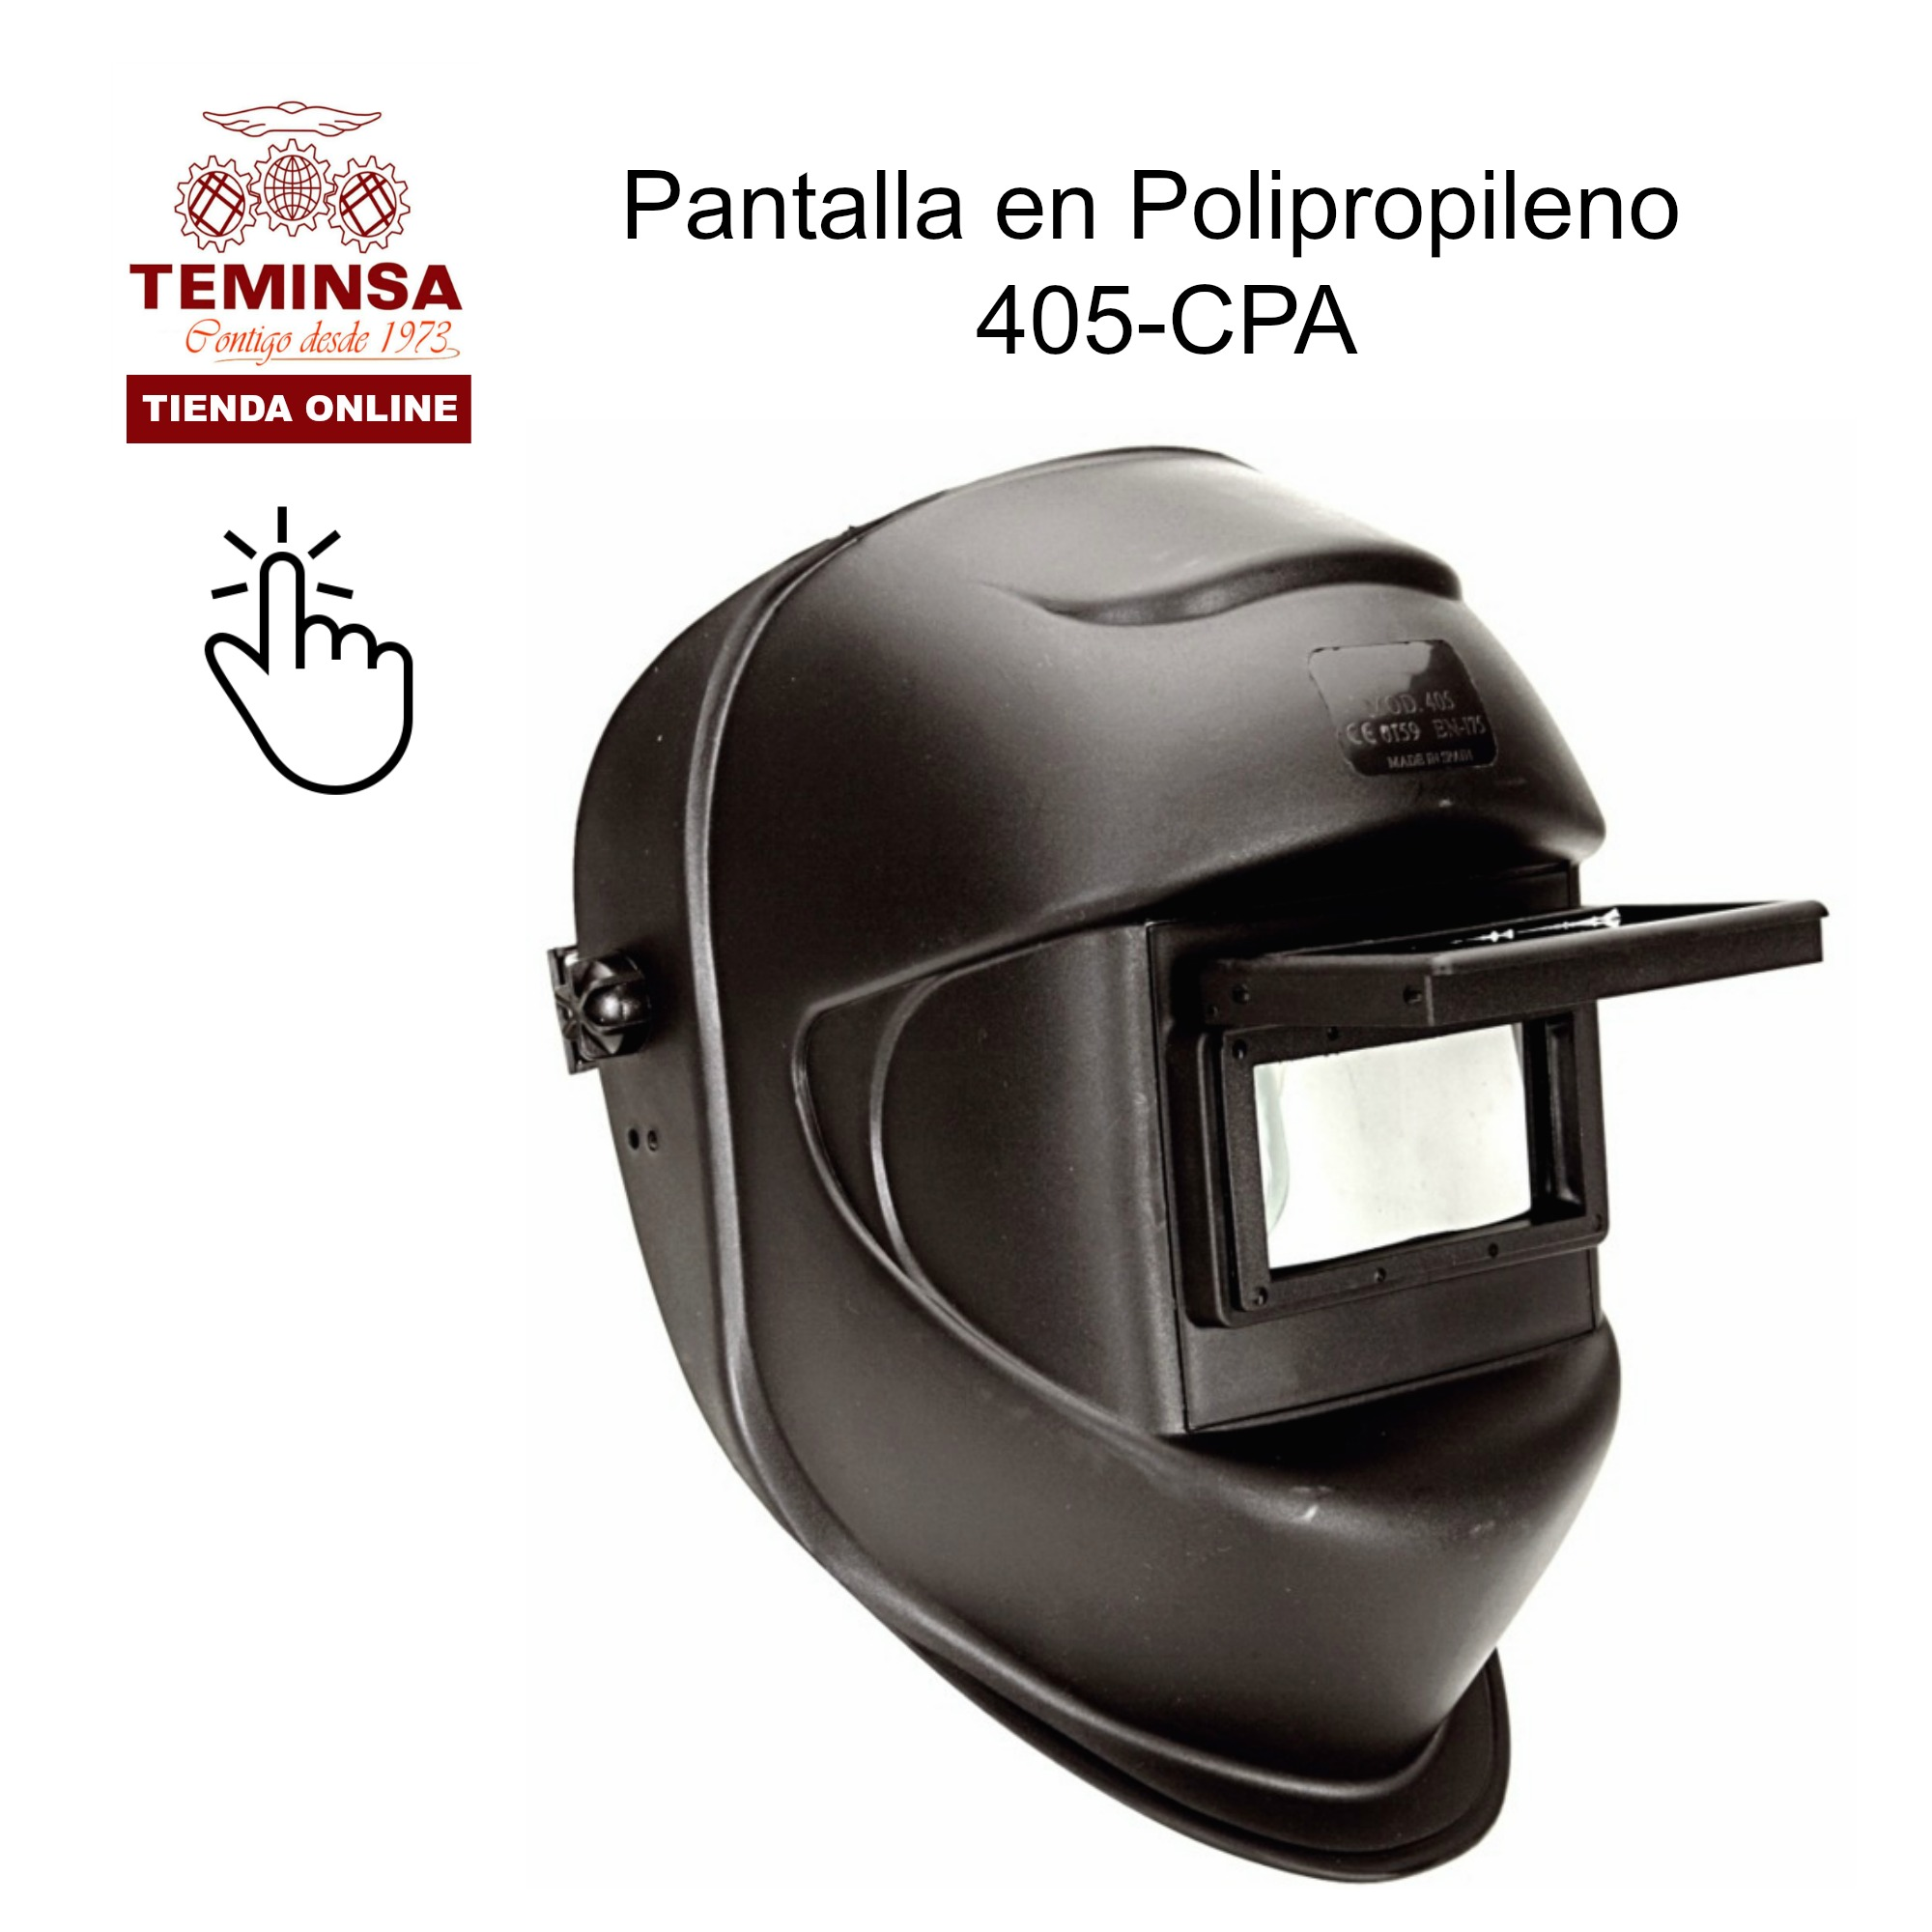 Pantalla Soldador  FIJACION CABEZA VENTANA MOVIL POLIPROPILENO 405-CPA Teminsa Online